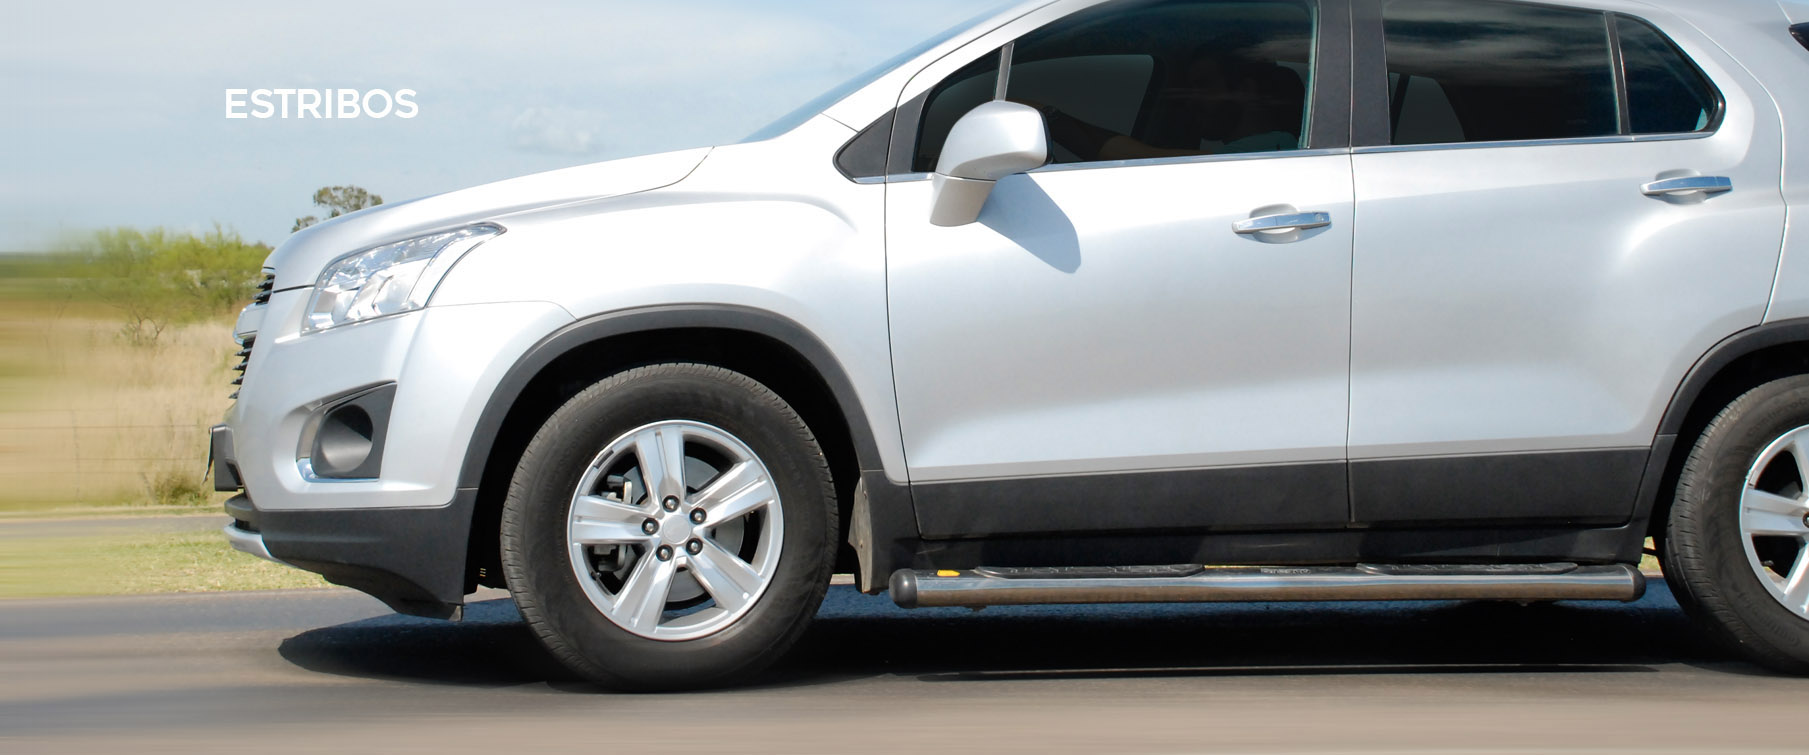 00001-estribos-bracco-SUV